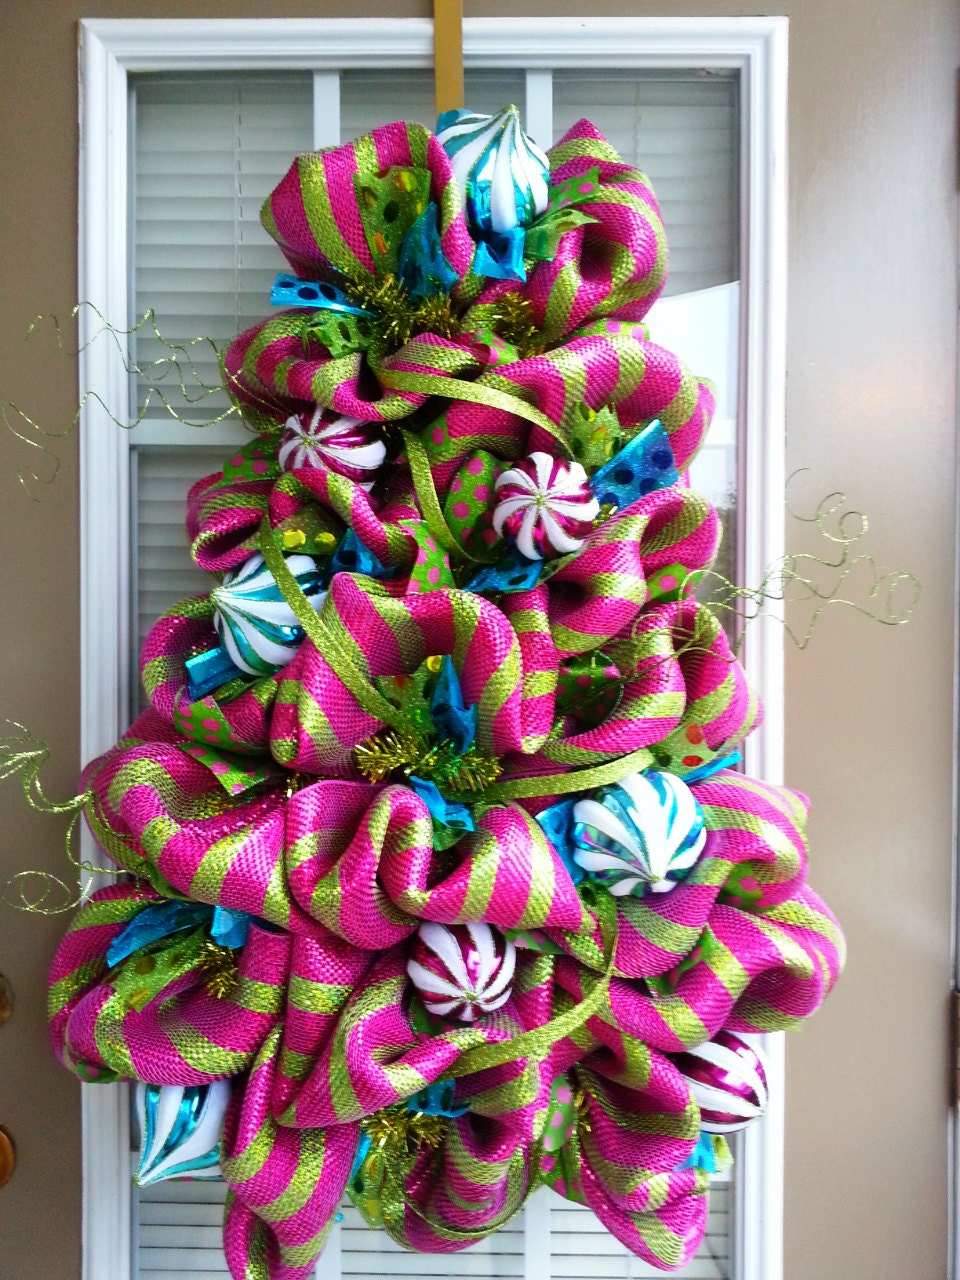 Deco Mesh Christmas Tree Shaped Door Wreath / Pink Turquoise